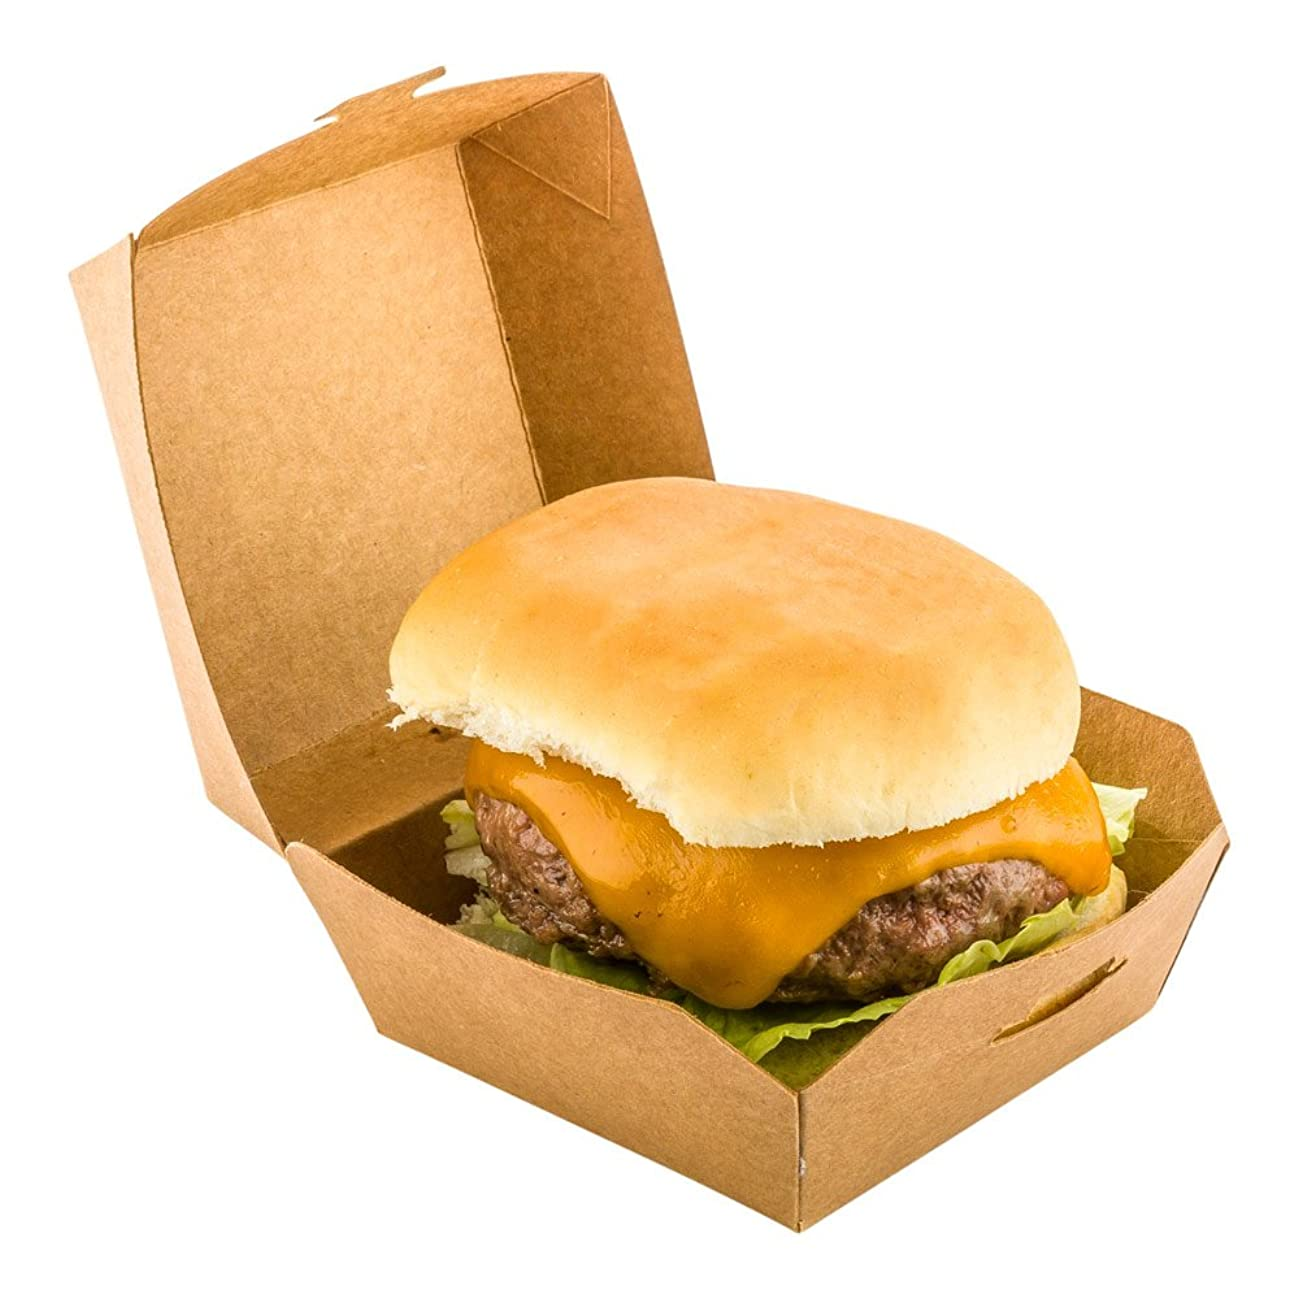 Mini Slider, Slider Burger, Mini Burger Box, Disposable Mini To Go Box - Kraft Brown - 2.75 Inch - 100ct Box - Restaurantware